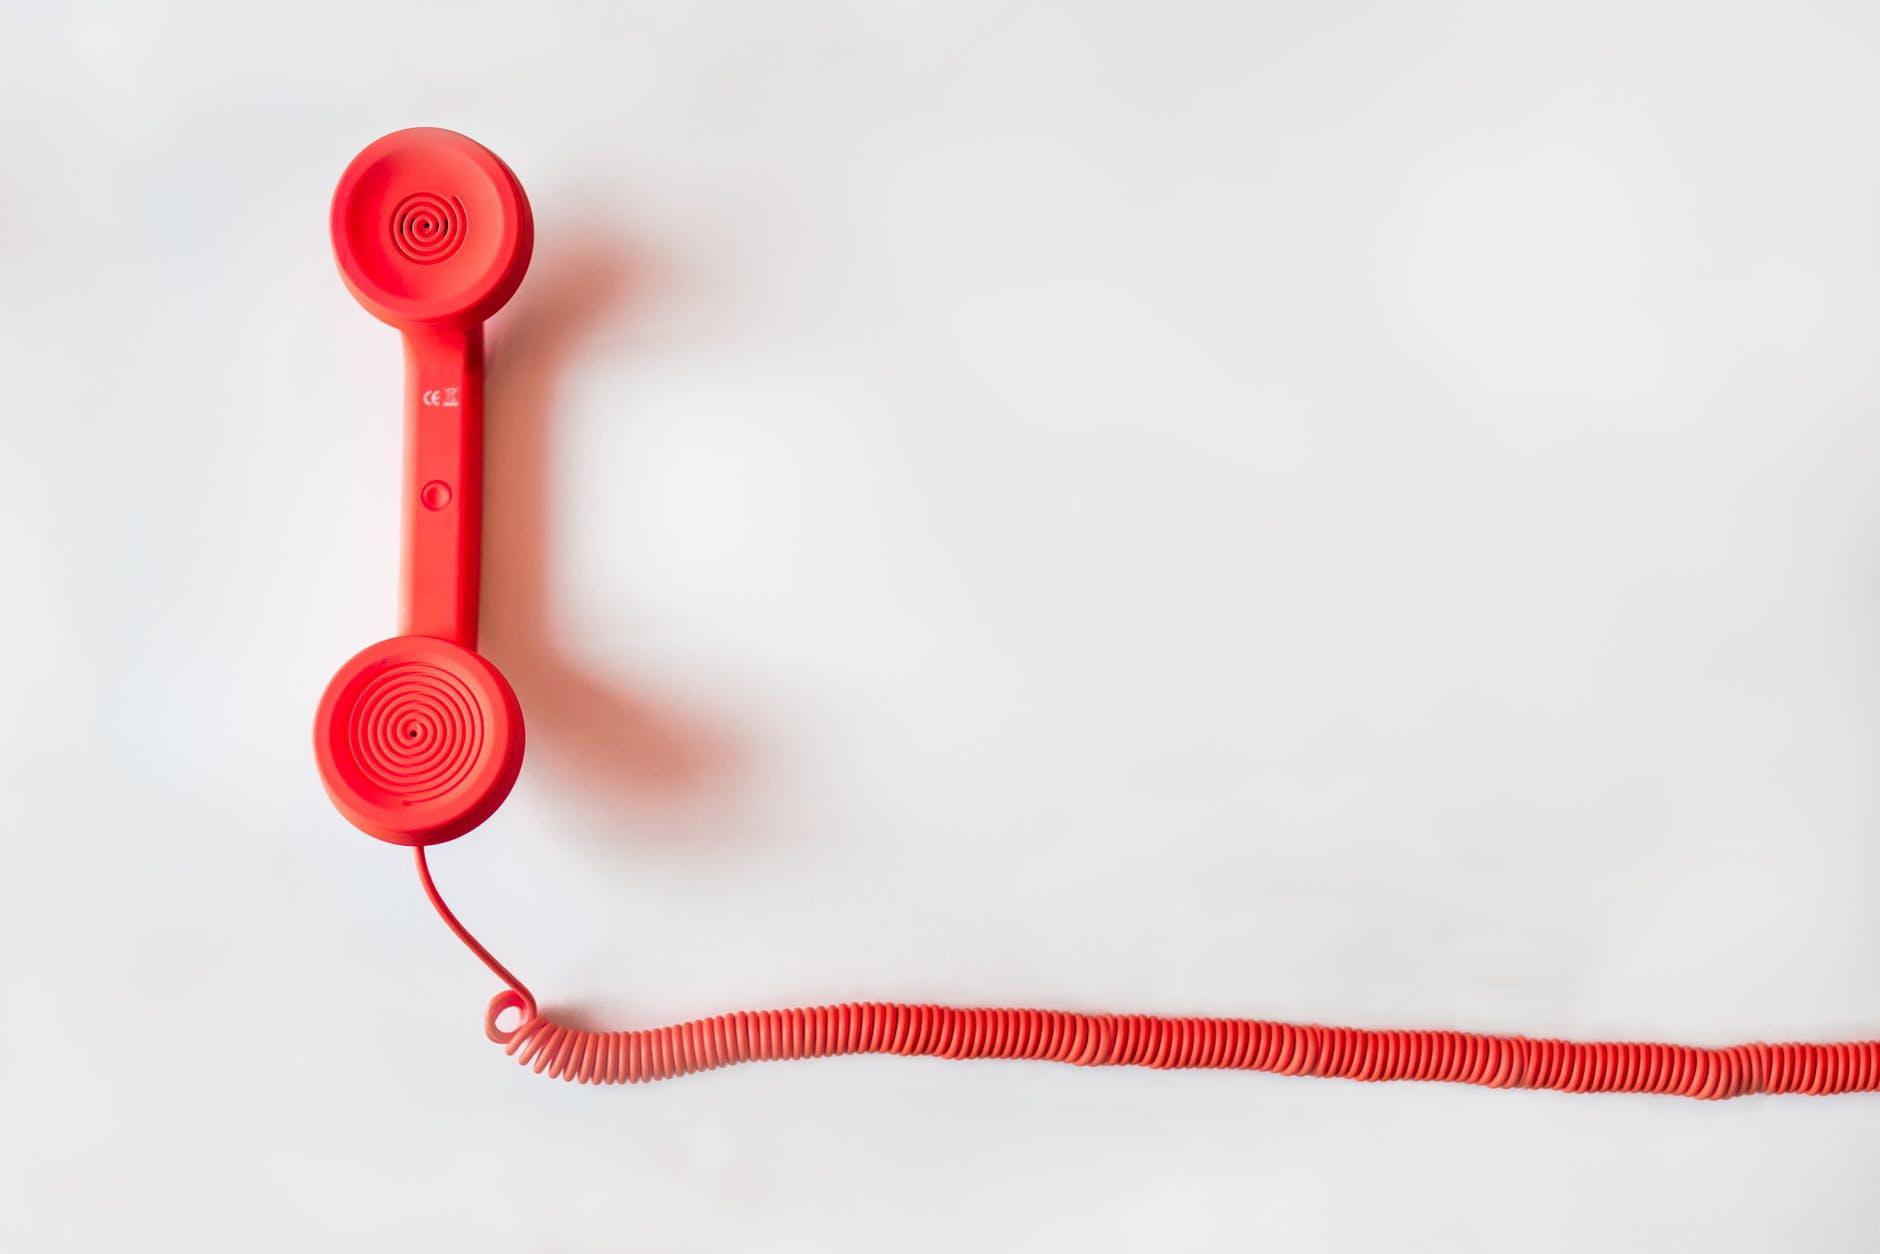 Foto de un teléfono rojo.